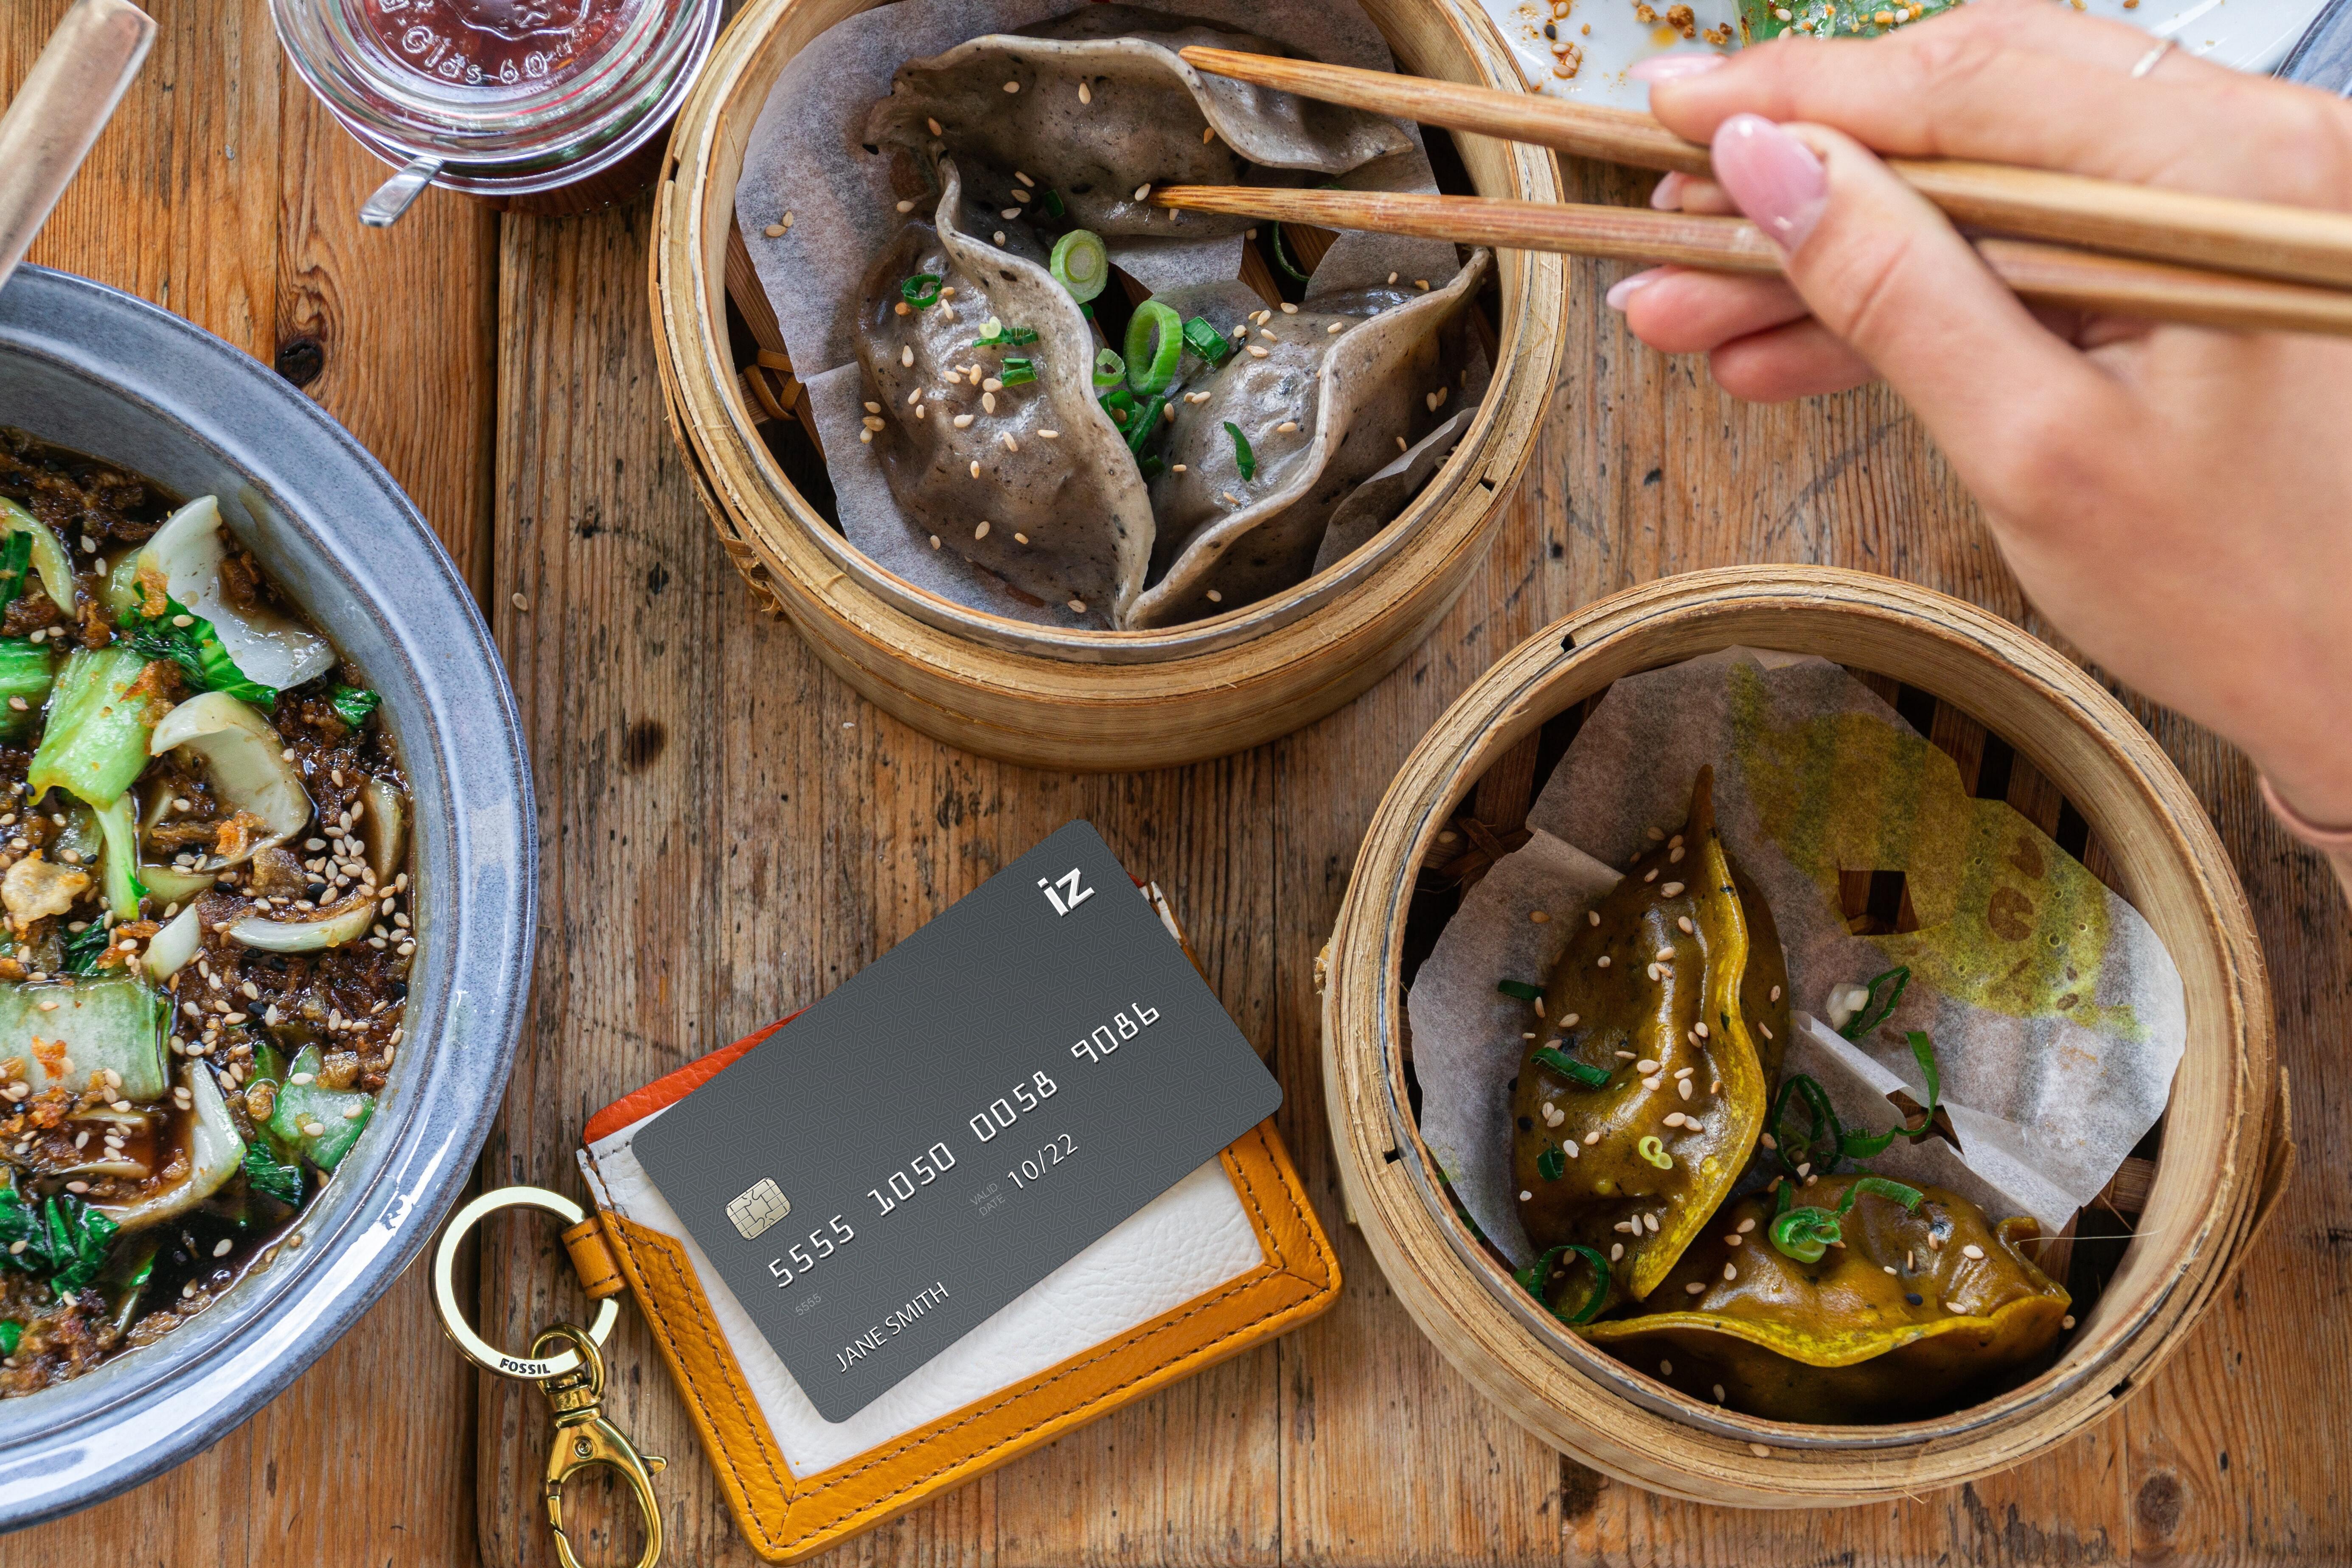 iSeatz-banking-rewards-and-dining